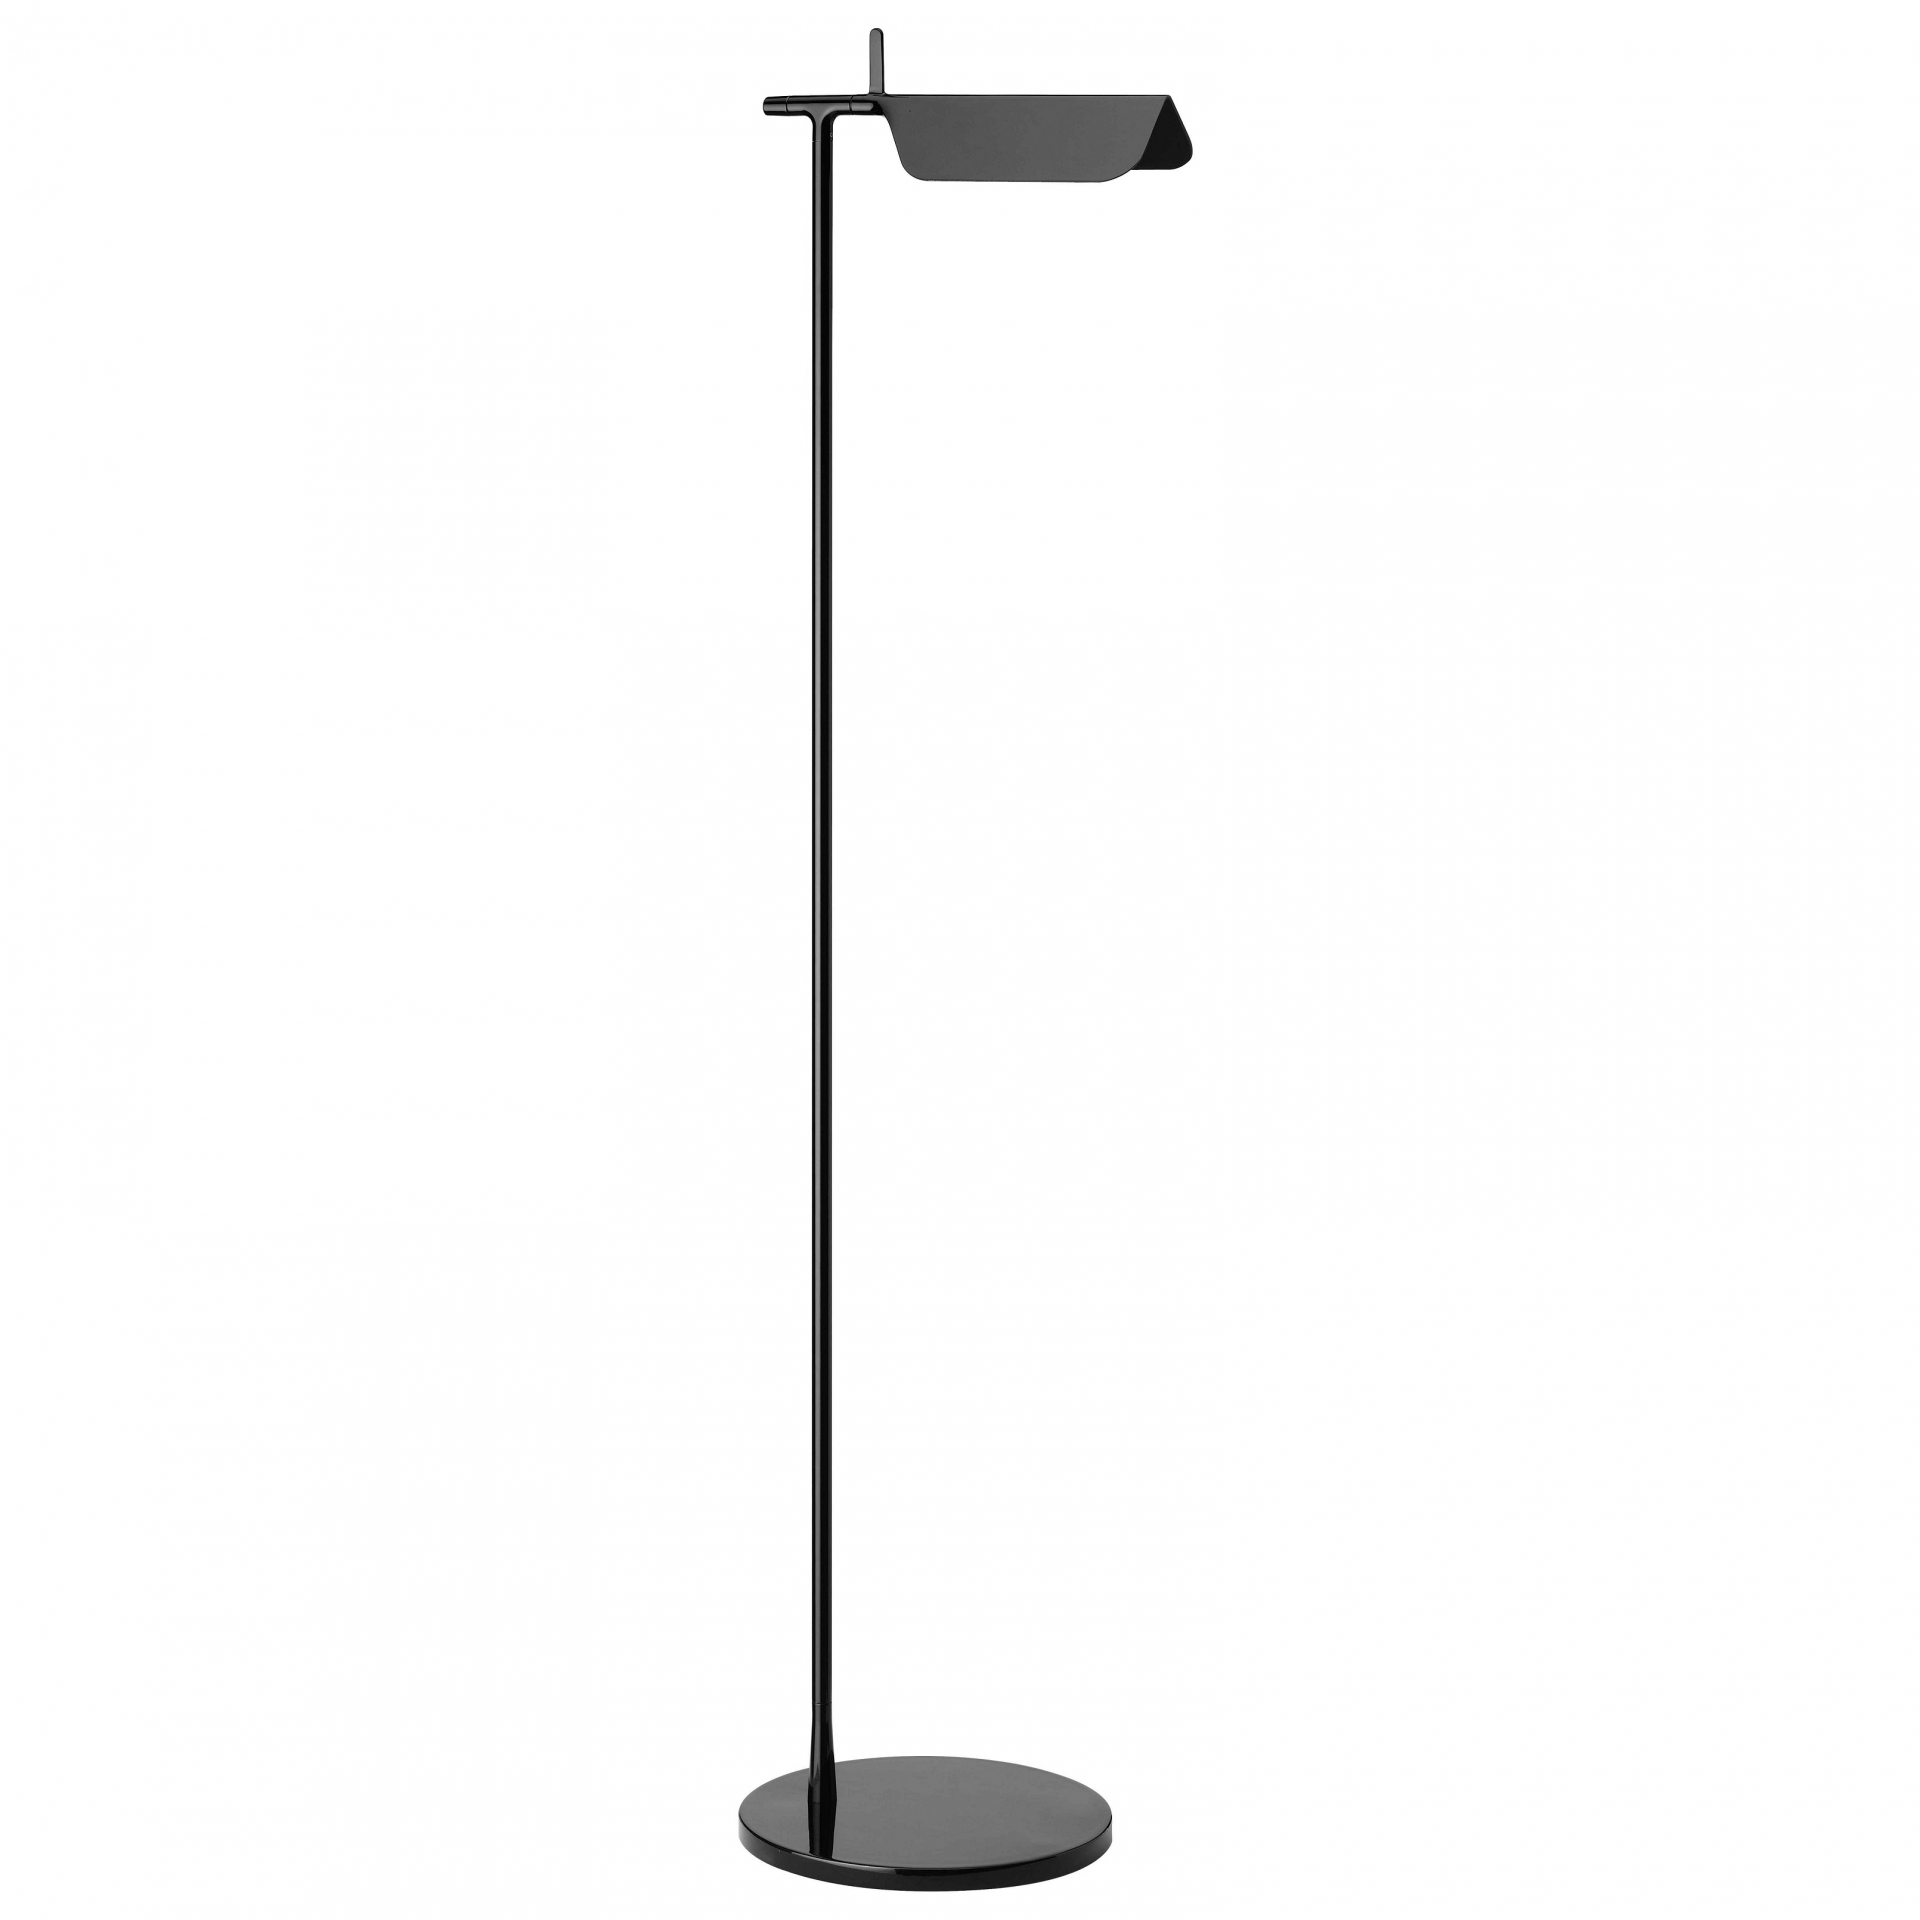 Flos designové stojací lampy Tab F